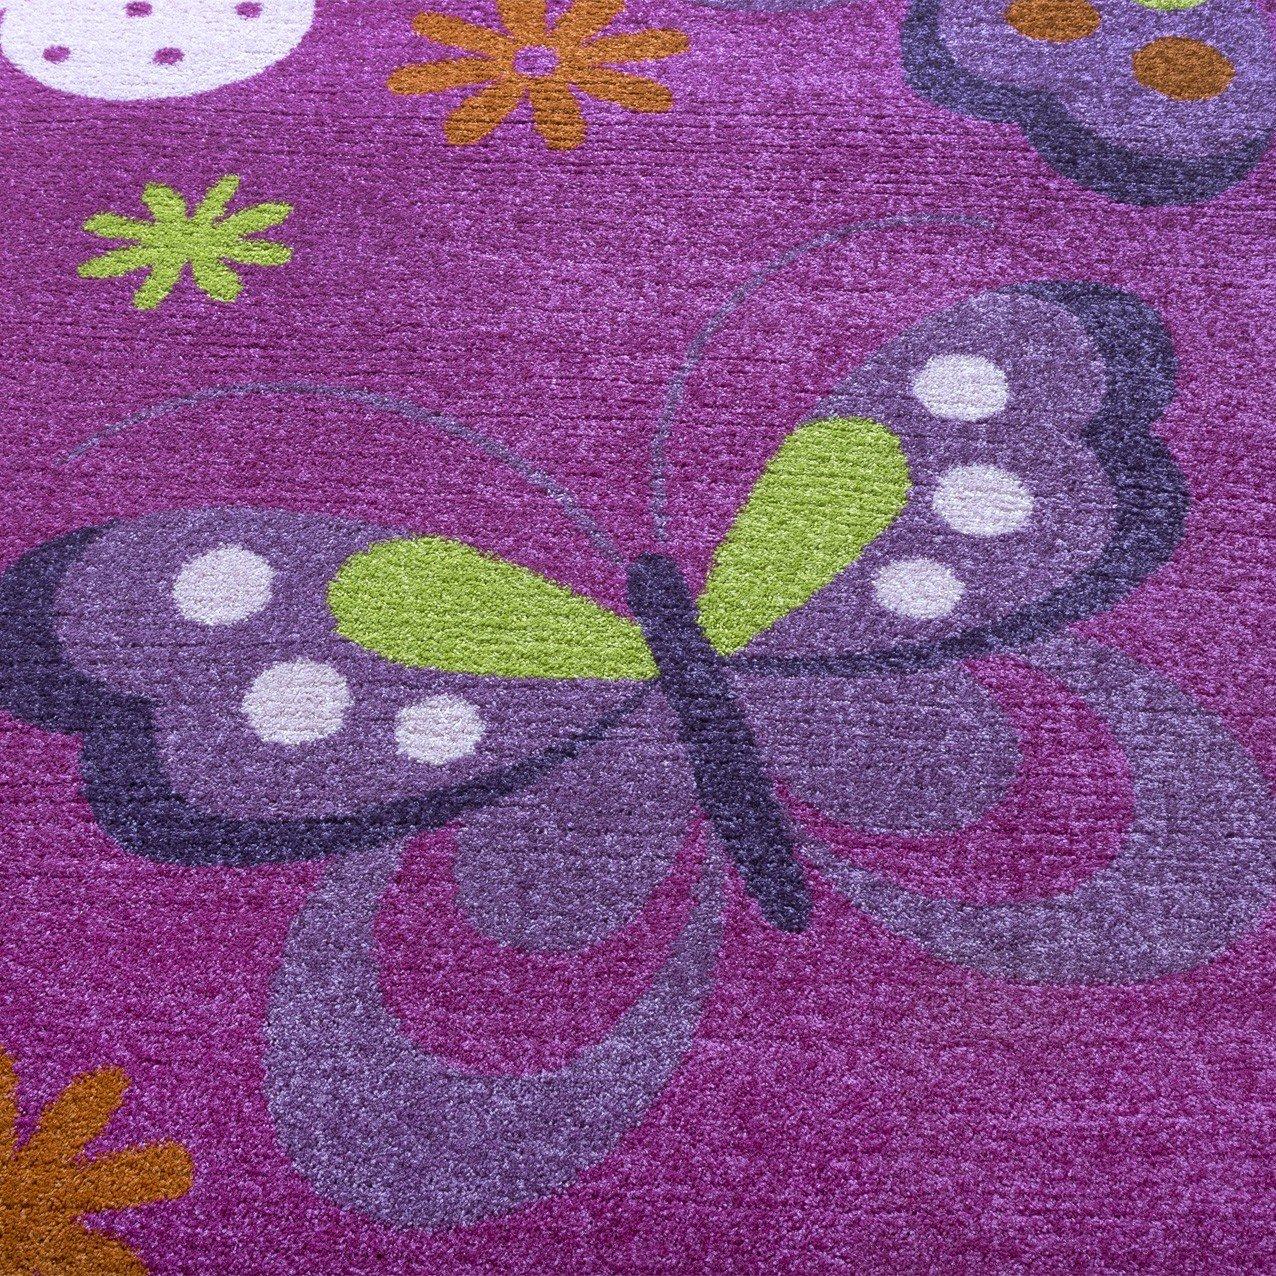 Kinderteppich schmetterling lila  Teppich Kinderzimmer Kinderteppich Schmetterling Muster Pink Lila ...